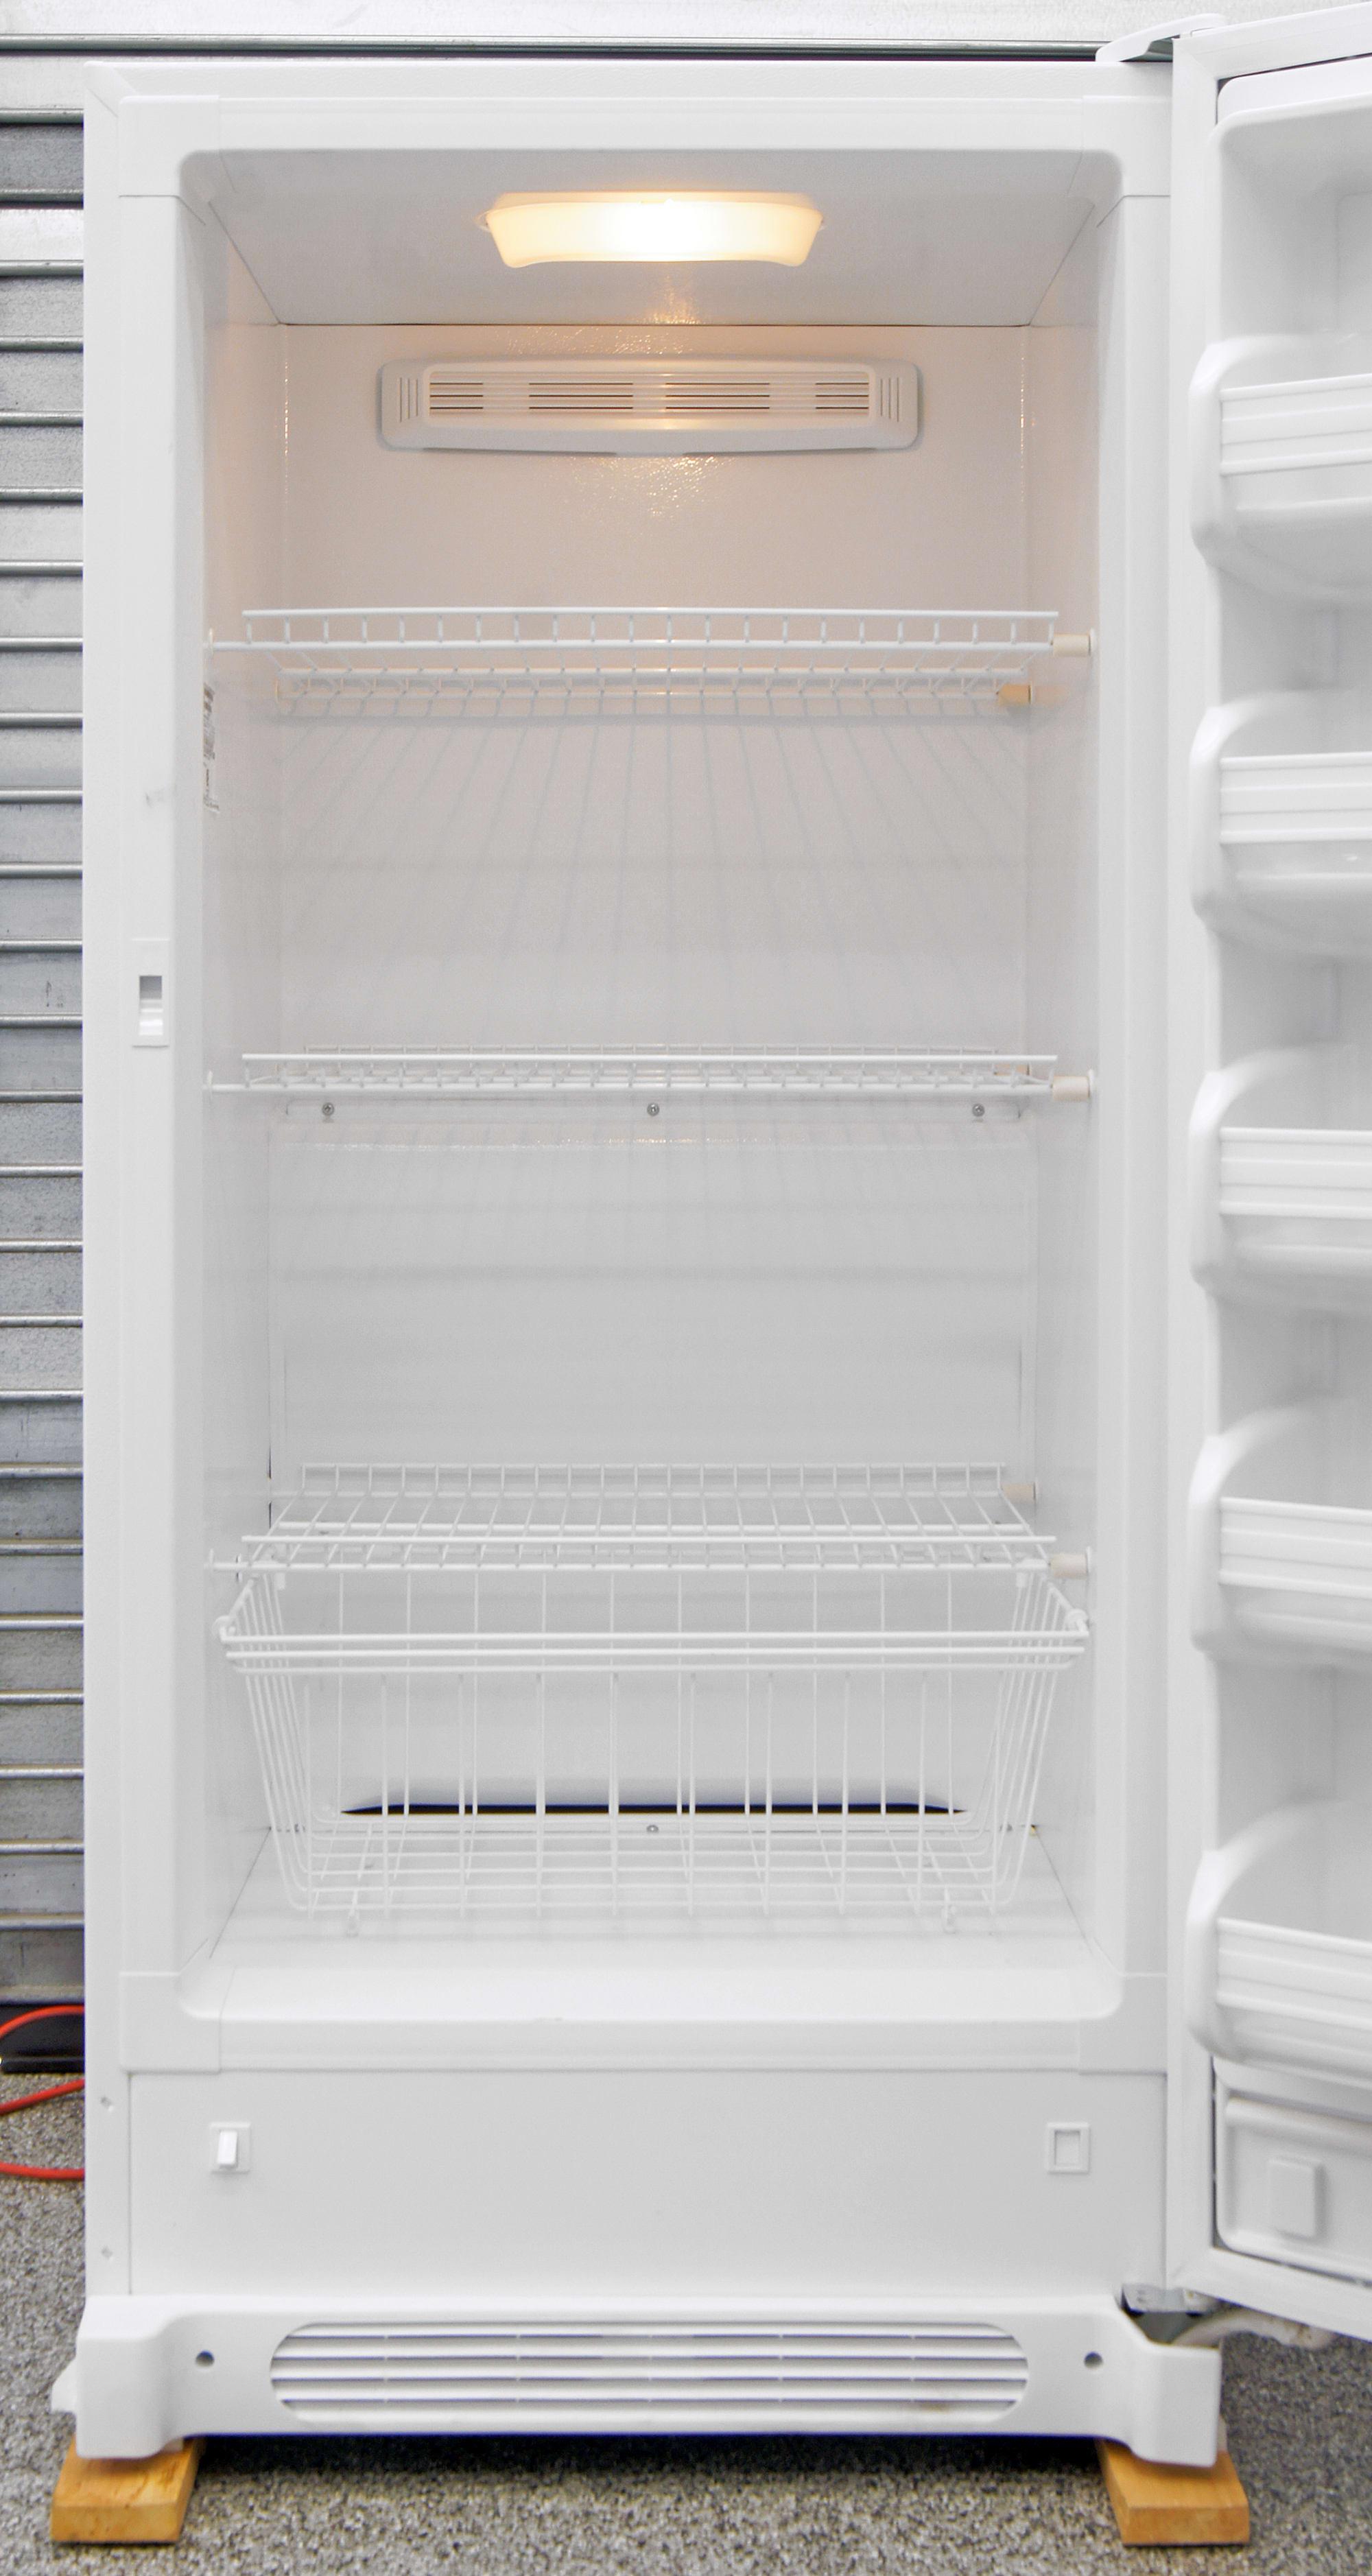 Kenmore 28432 Freezer Review - Reviewed.com Freezers